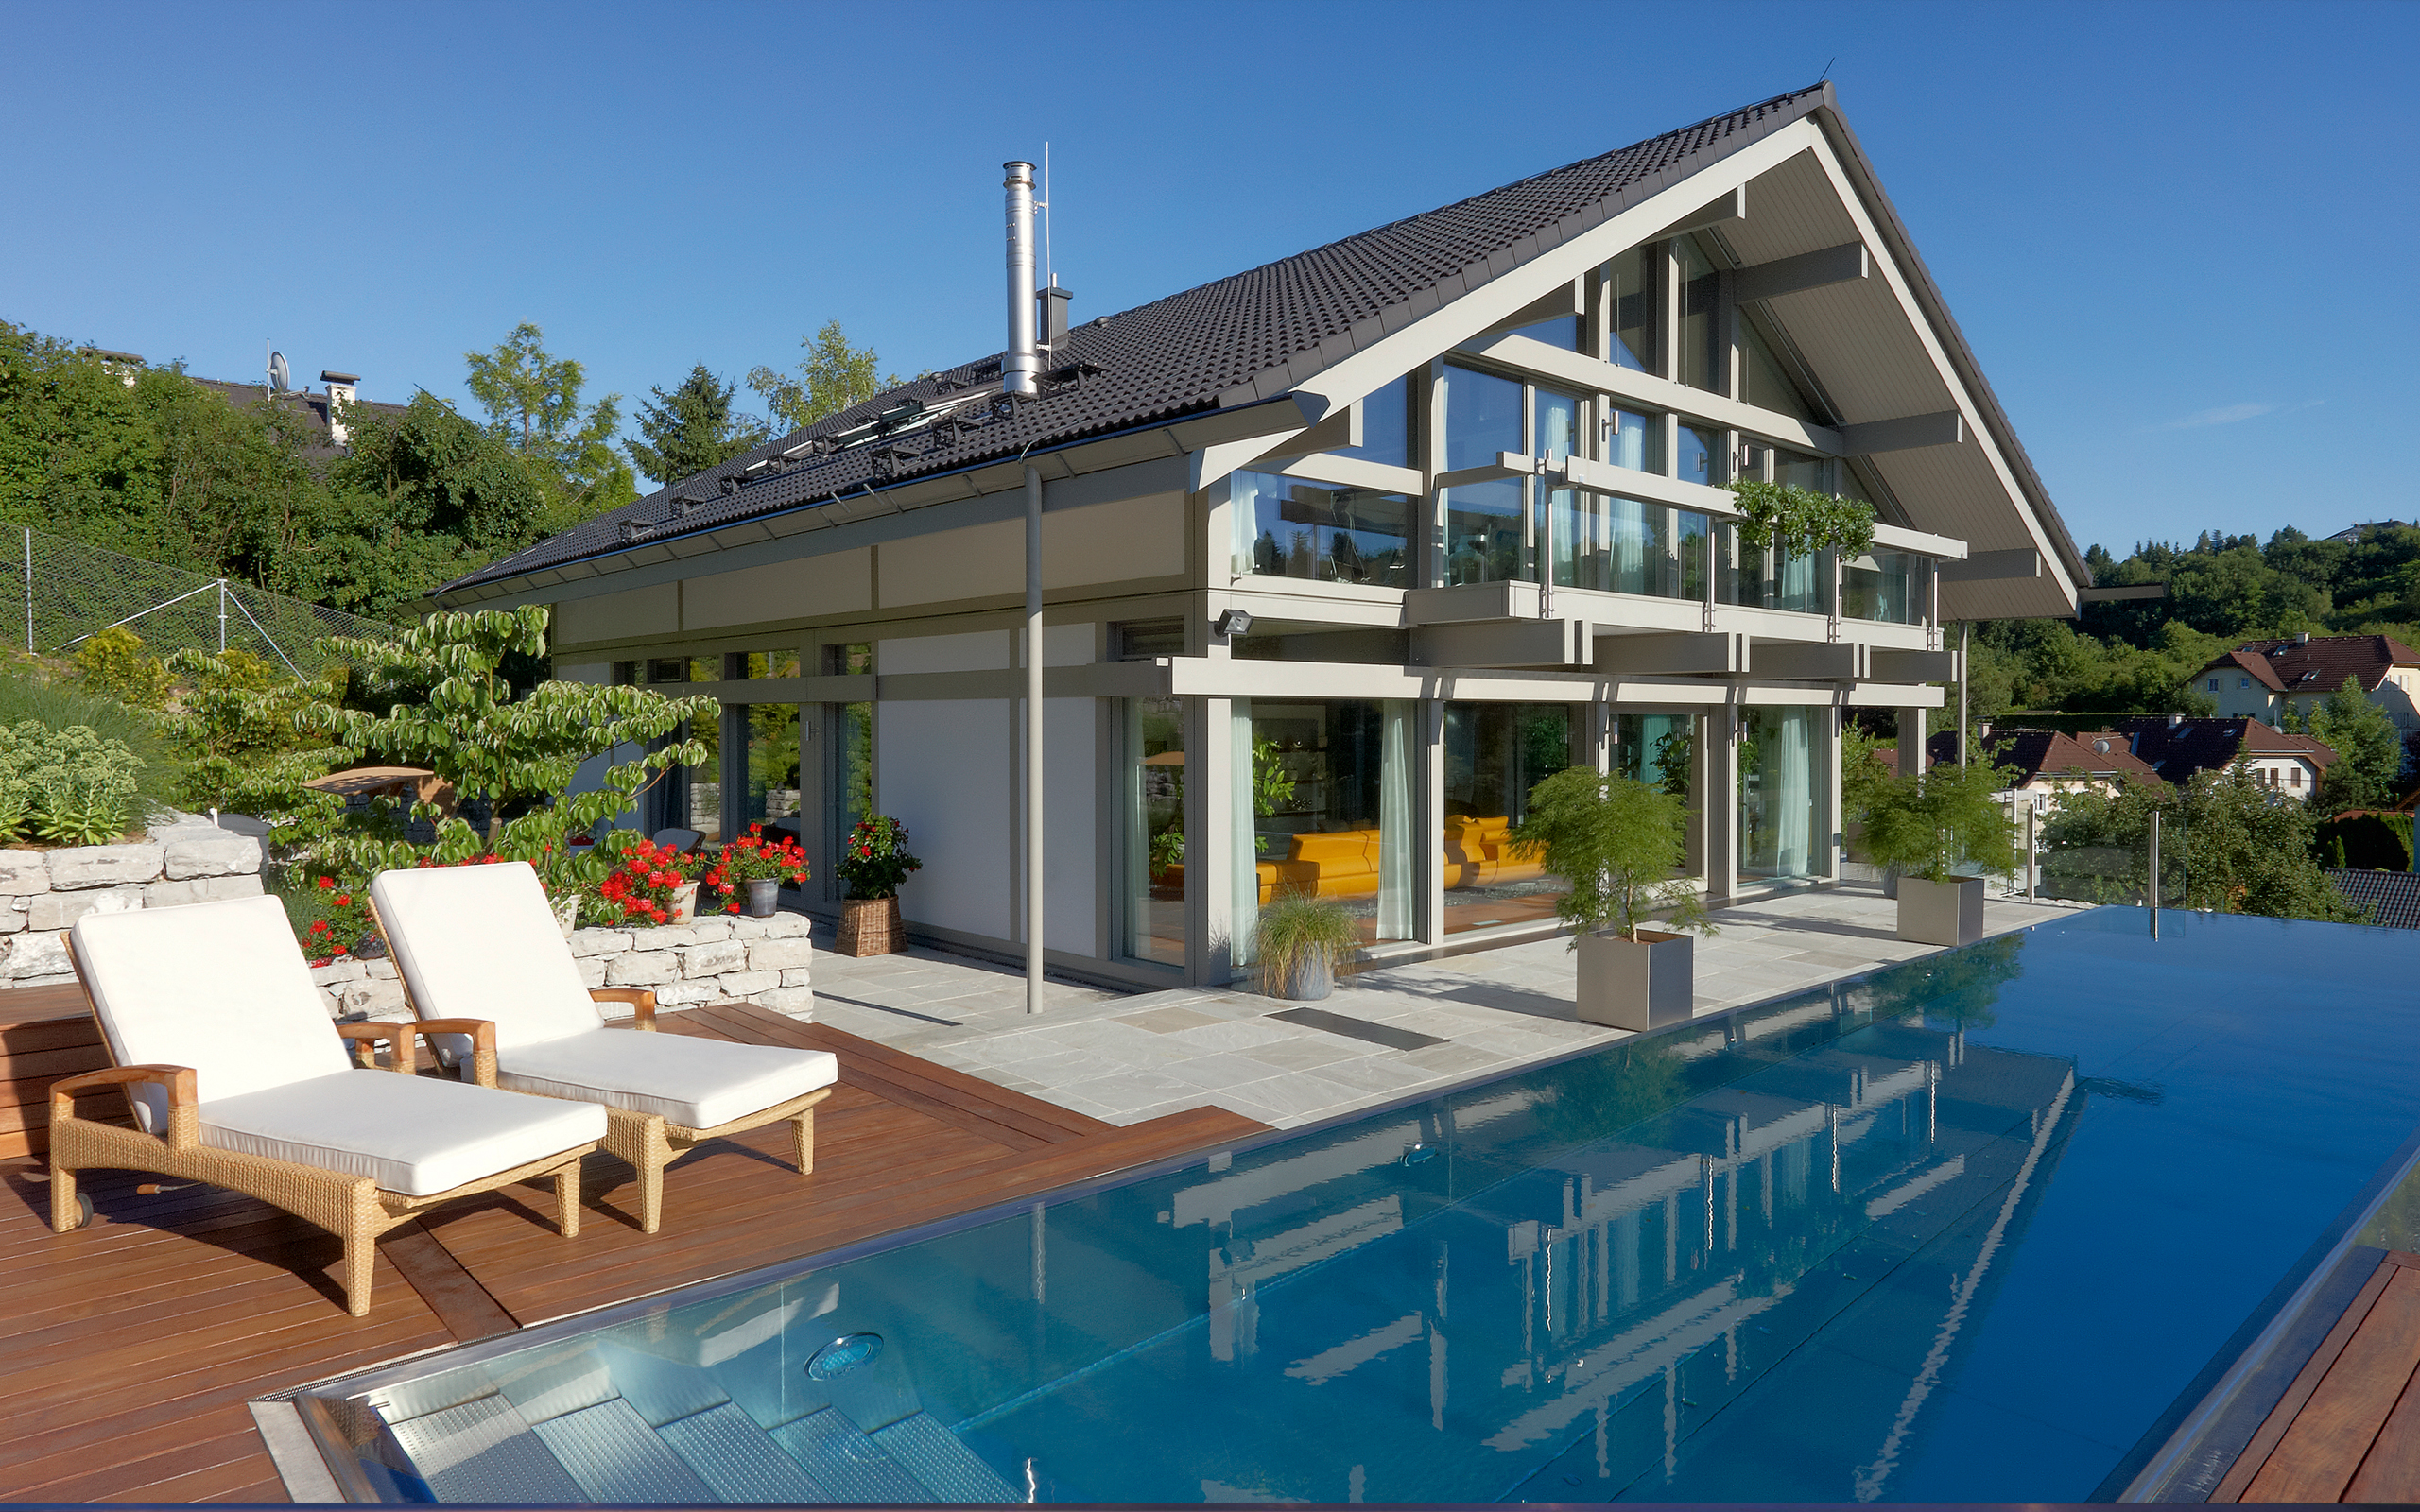 edelstahl in bestform panorama pool mit infinity berlaufrinne. Black Bedroom Furniture Sets. Home Design Ideas